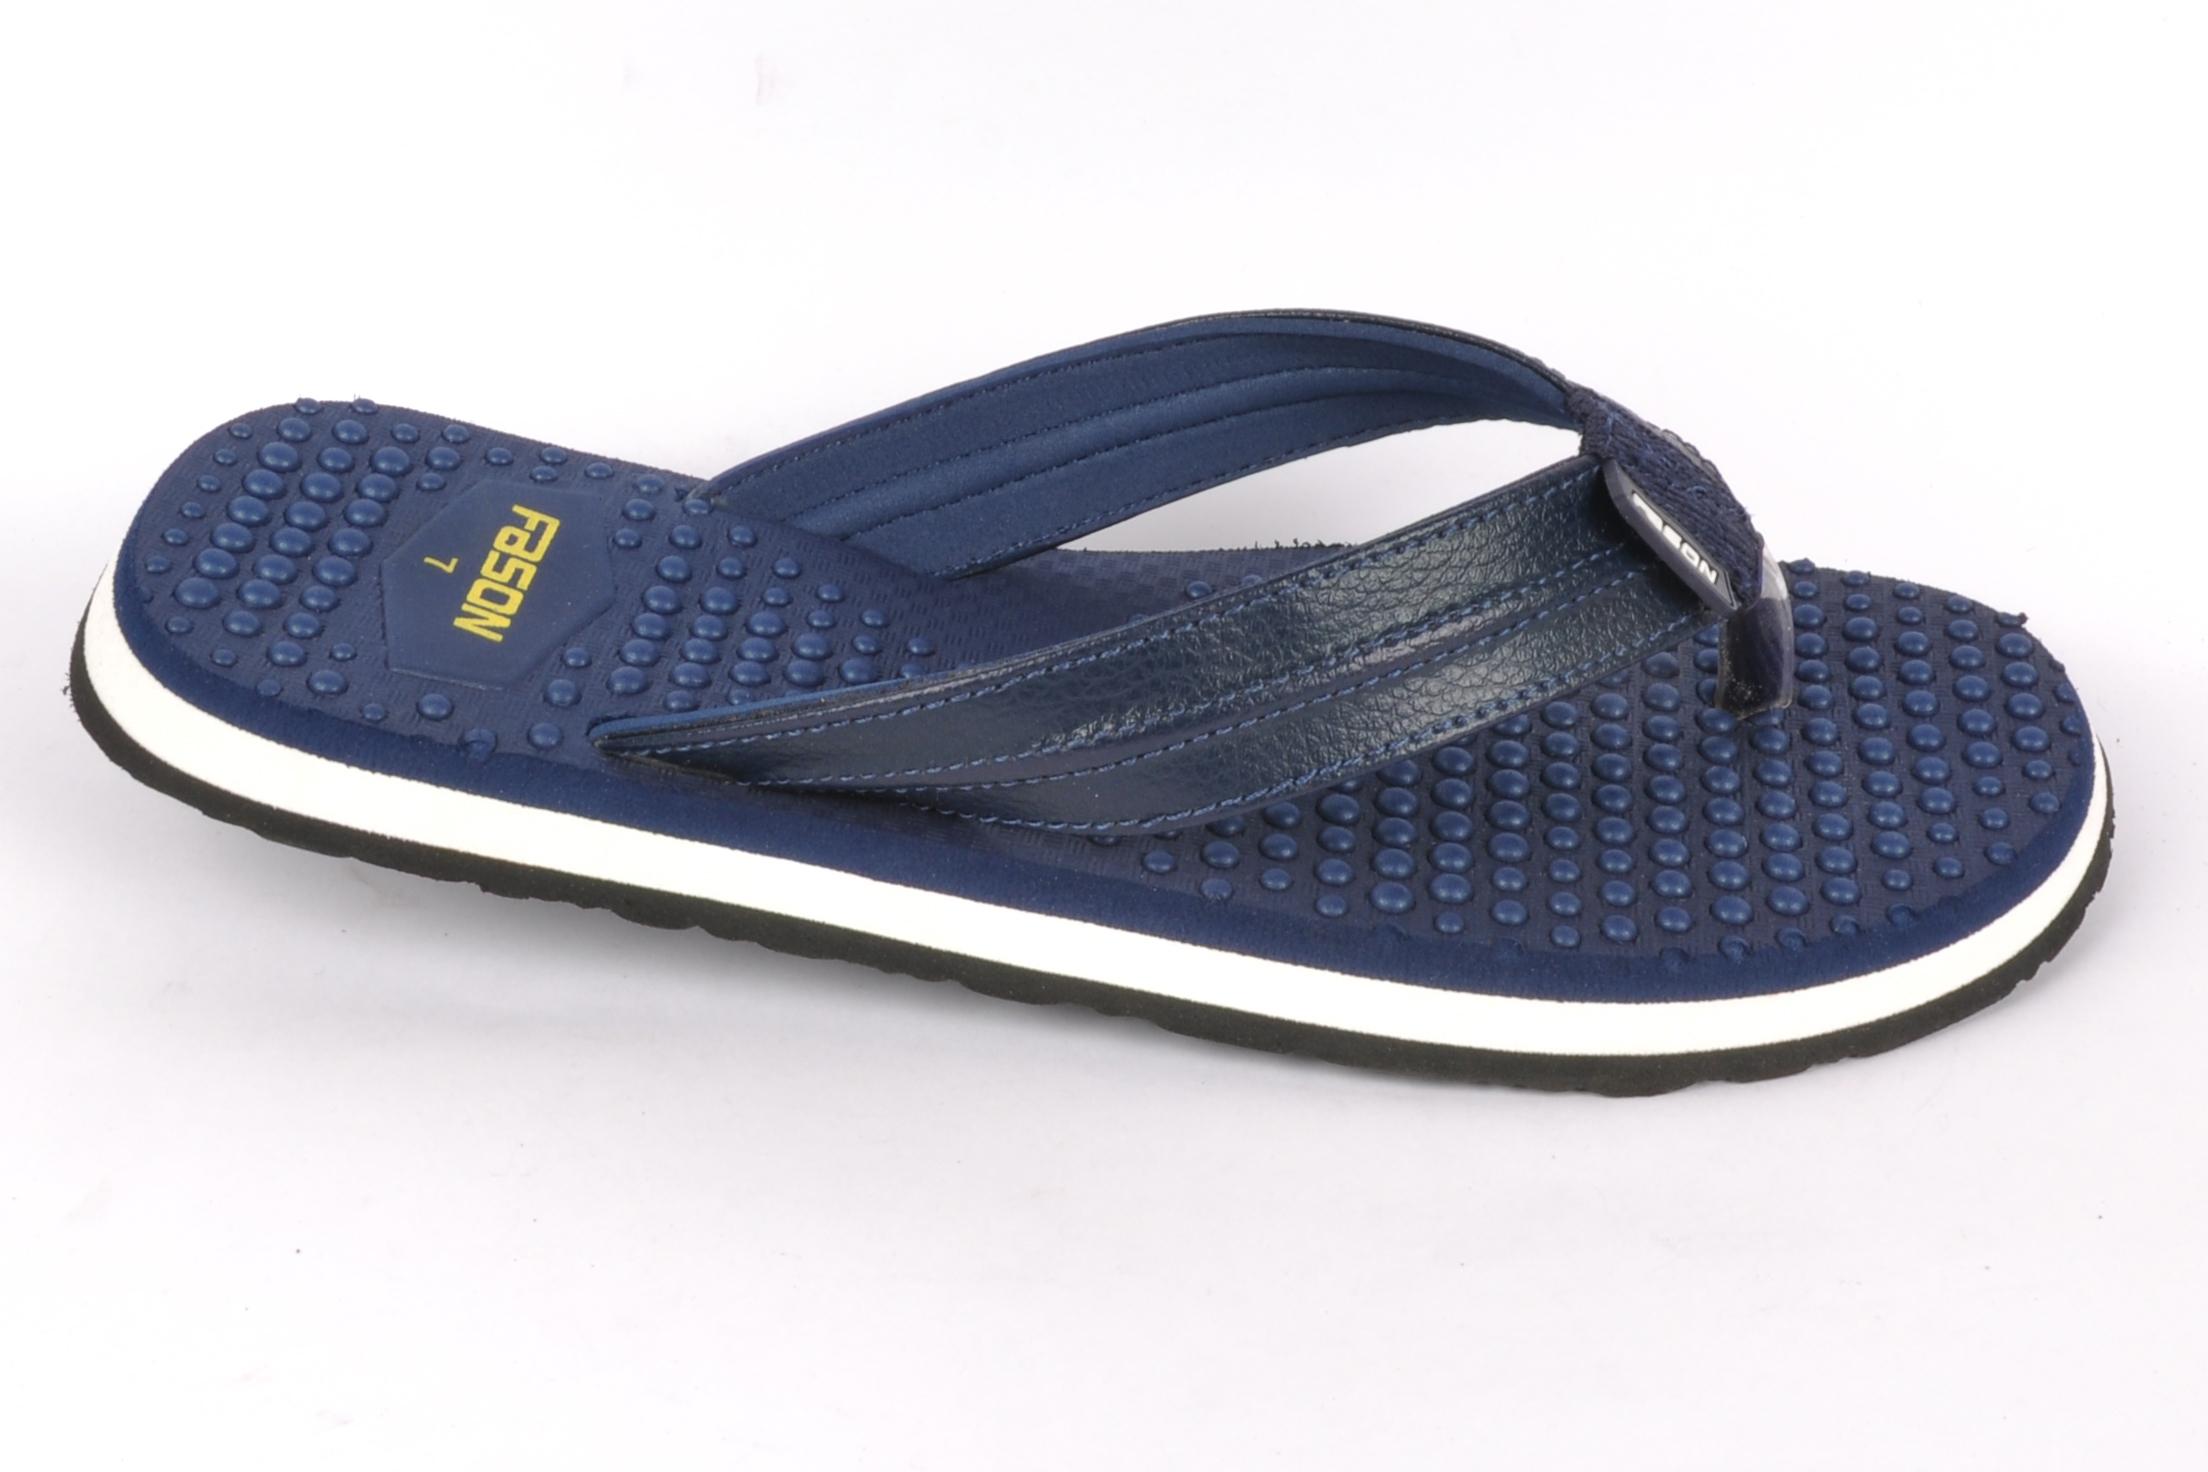 Navy Blue Flip Flop Slipper